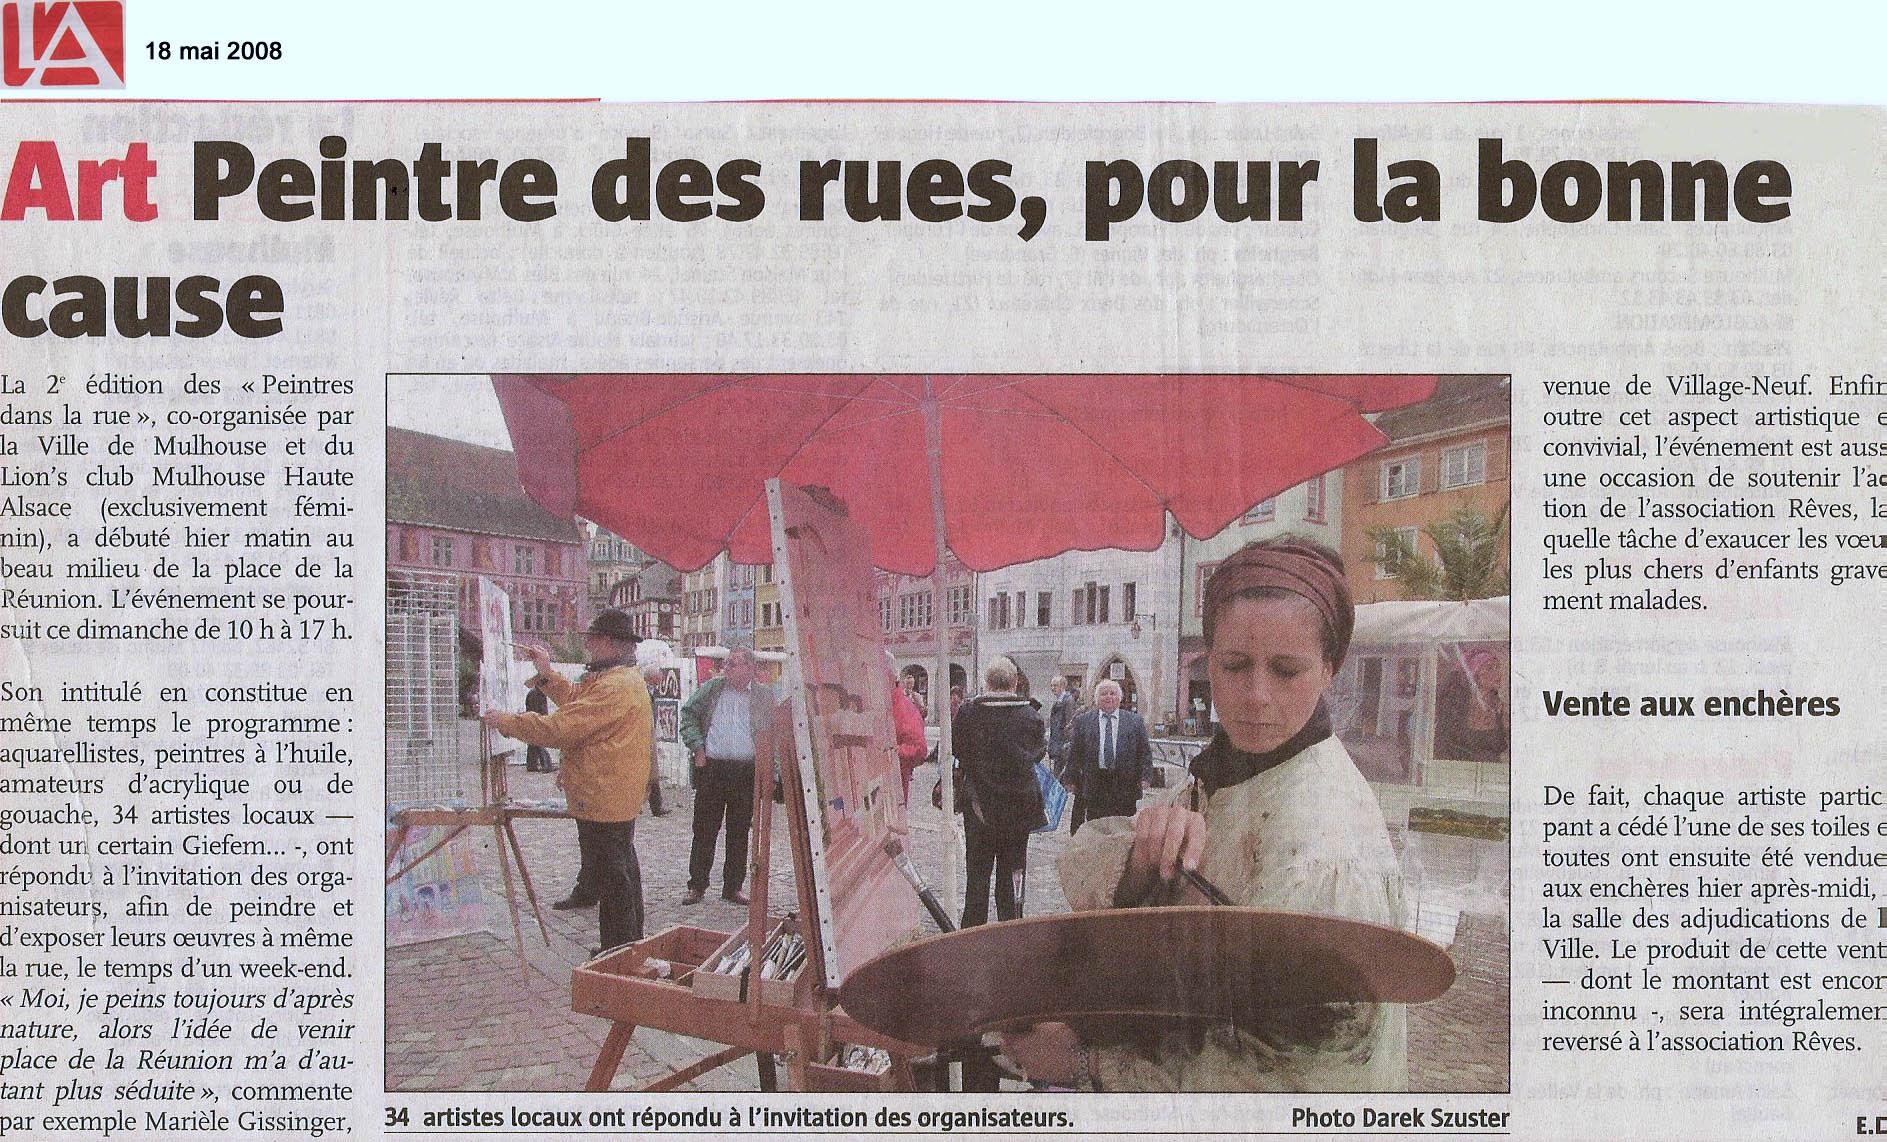 Fresque-Gissinger-Mariele-Peinture-huile-Peinte-Artiste-Art-gm-Alsace-France